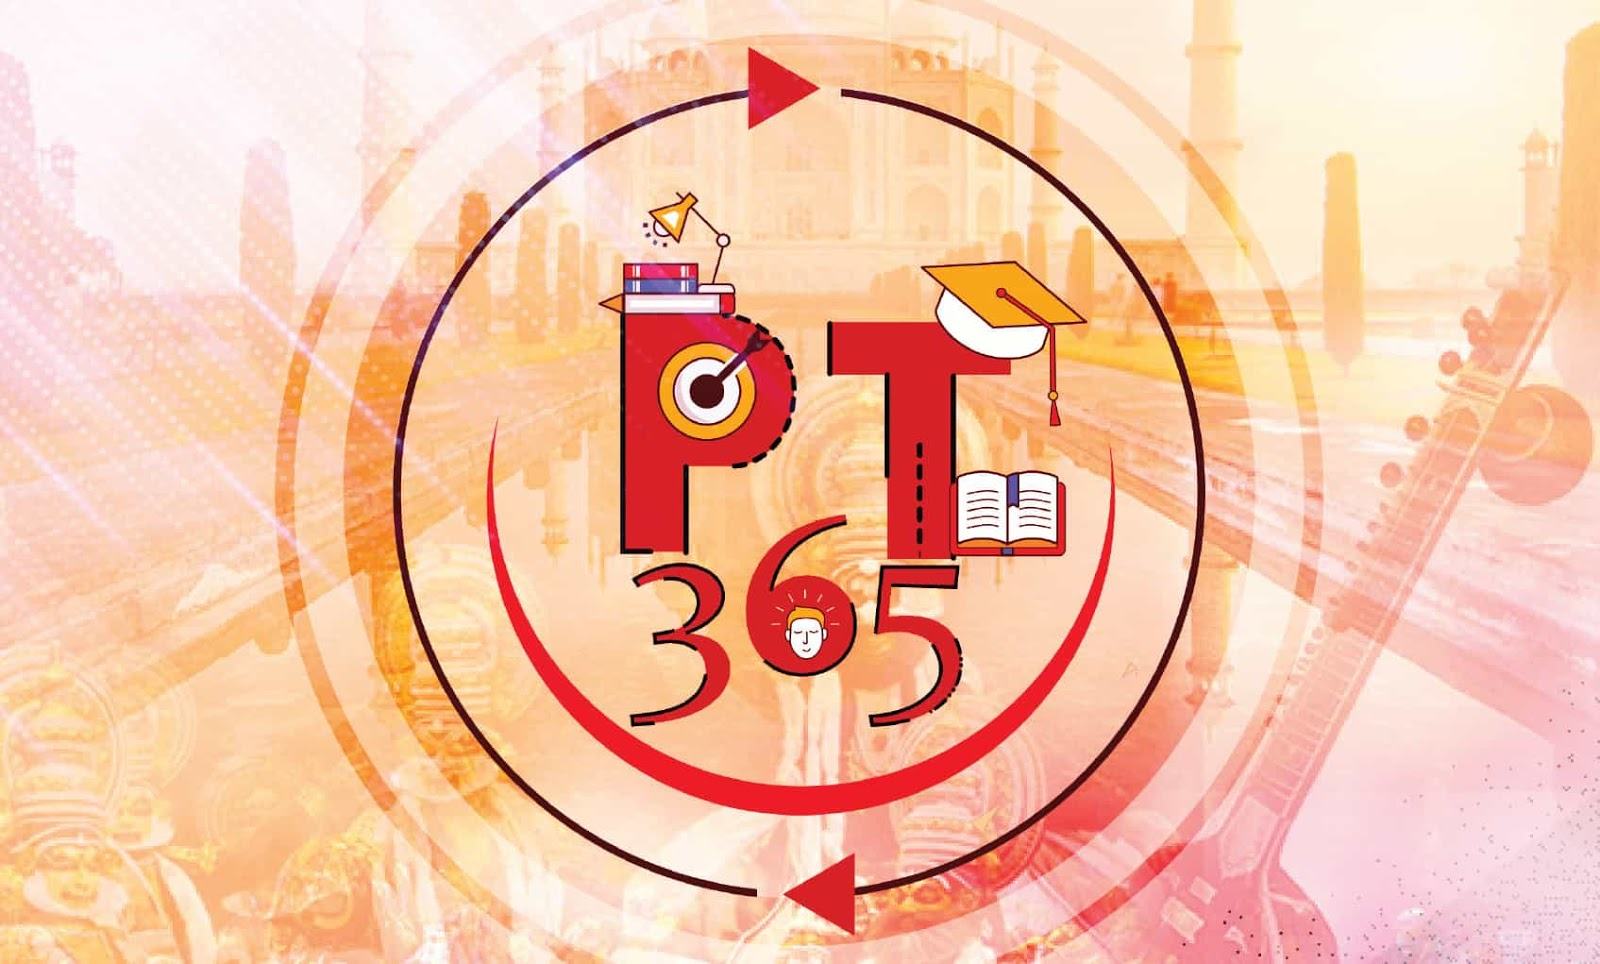 Vision IAS PT 365 IAS Prelims 2020